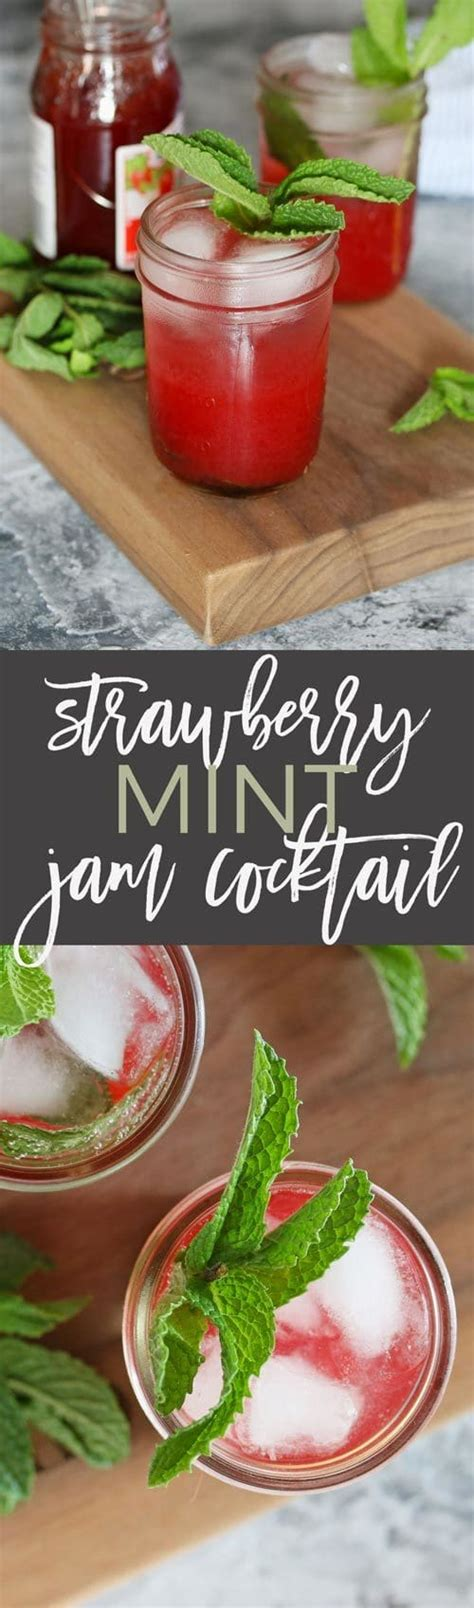 Strawberry Mint Jam strawberry mint jam cocktail for summer